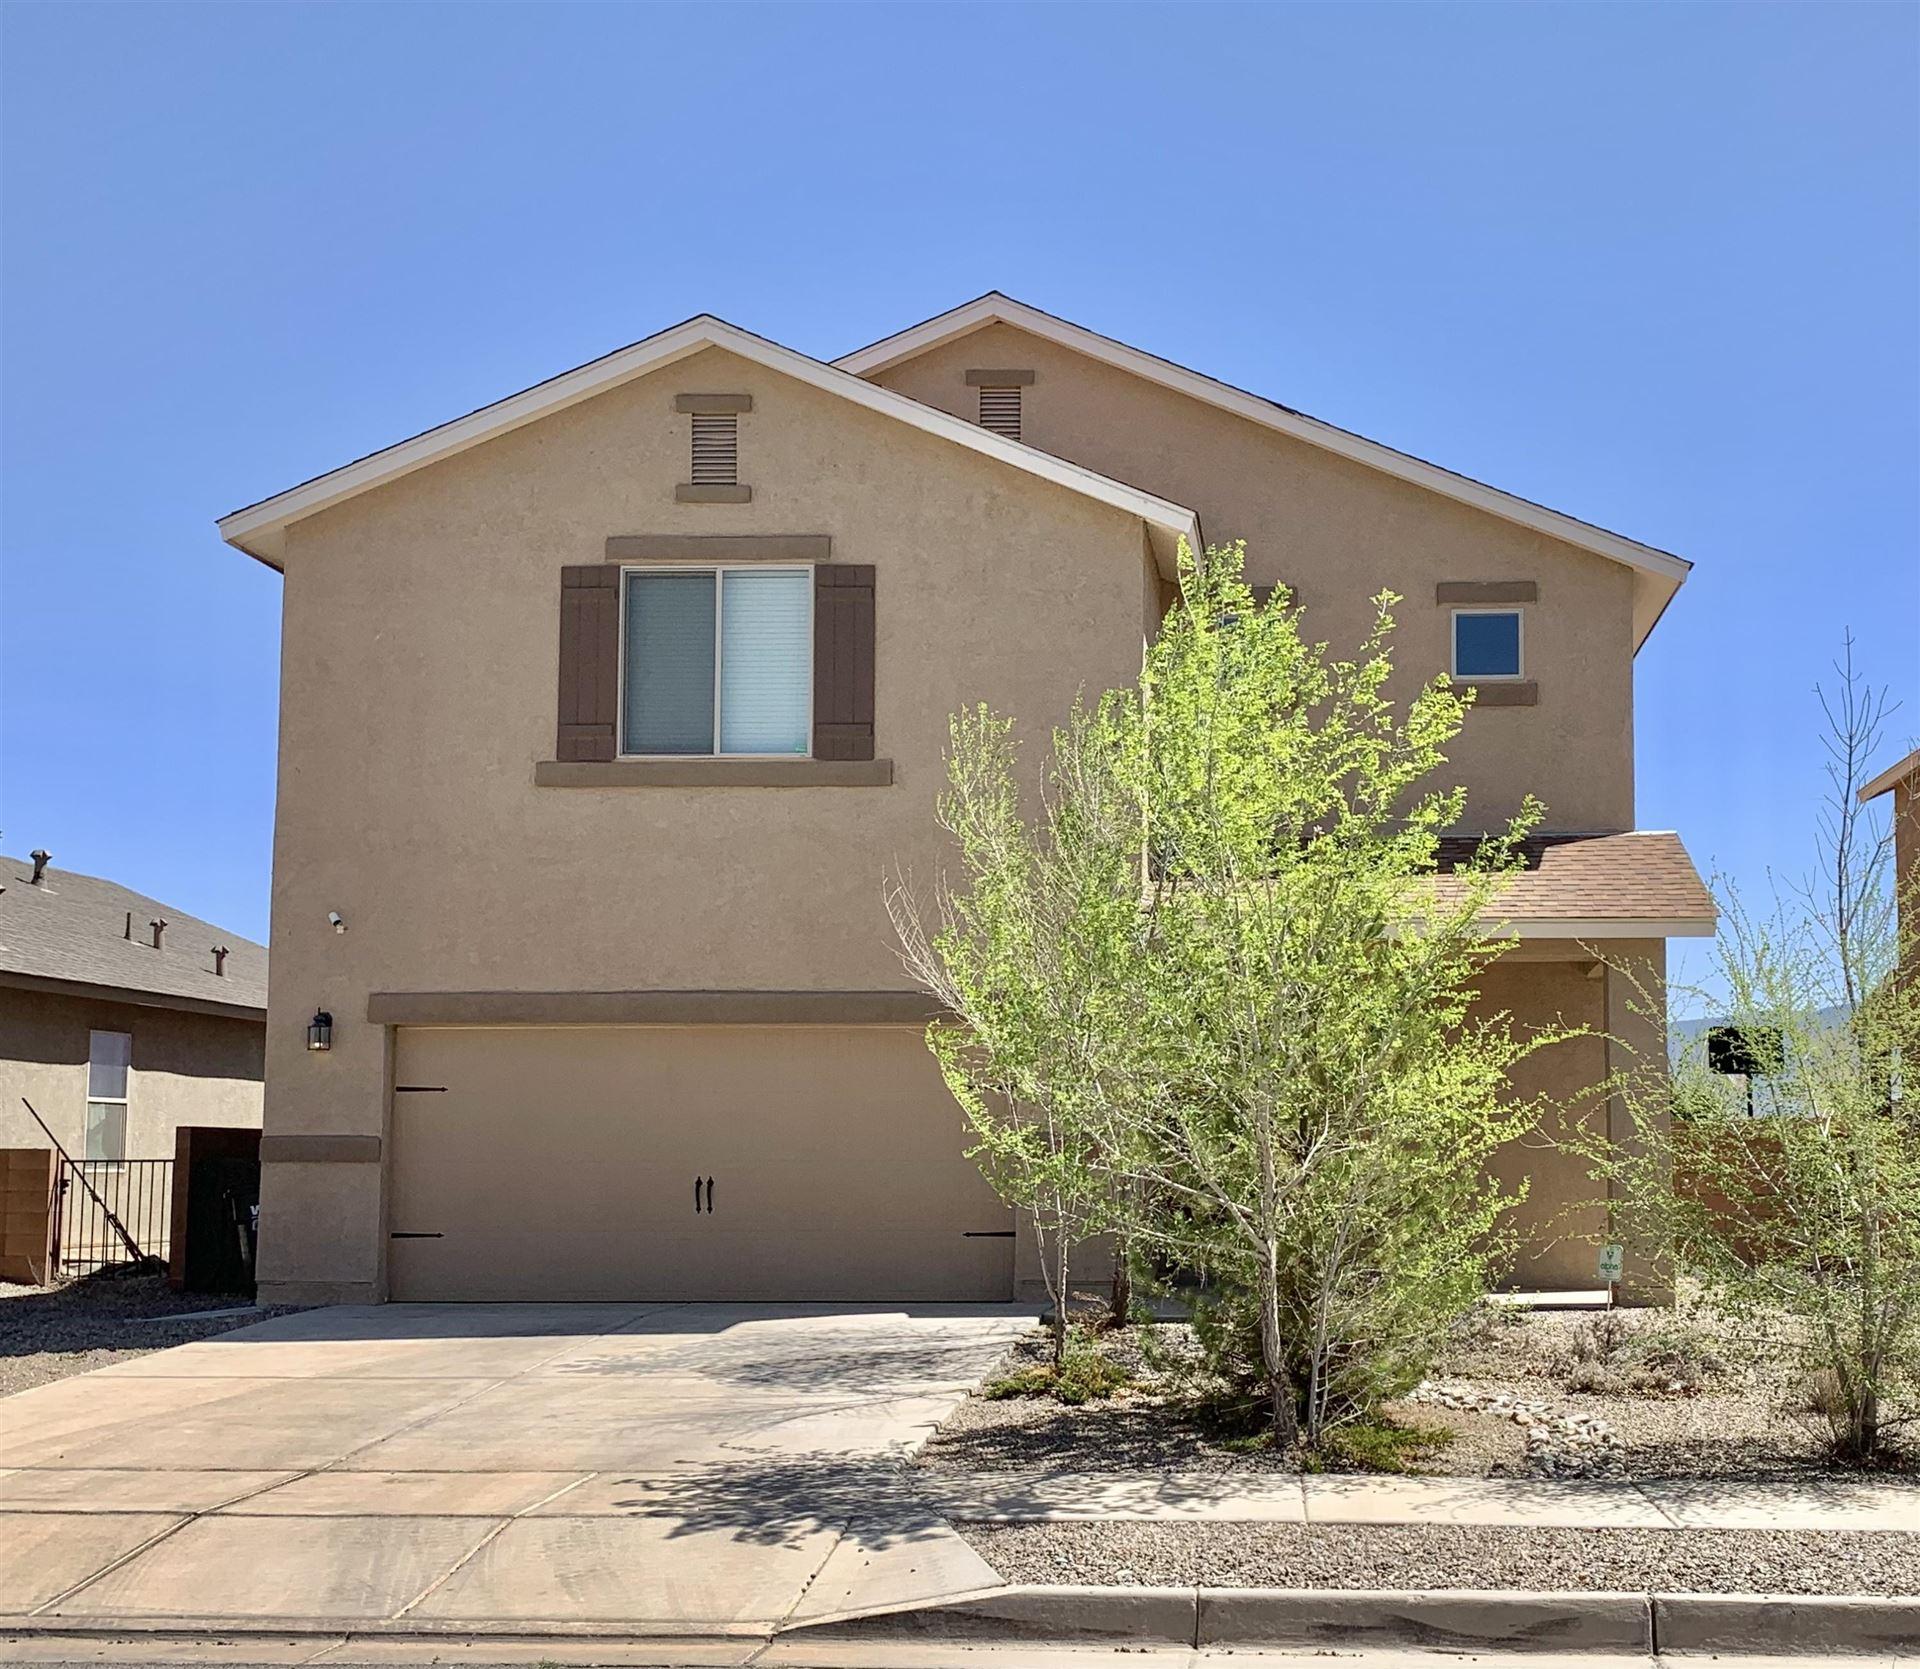 Photo of 1722 LARK Drive NE, Rio Rancho, NM 87144 (MLS # 989740)